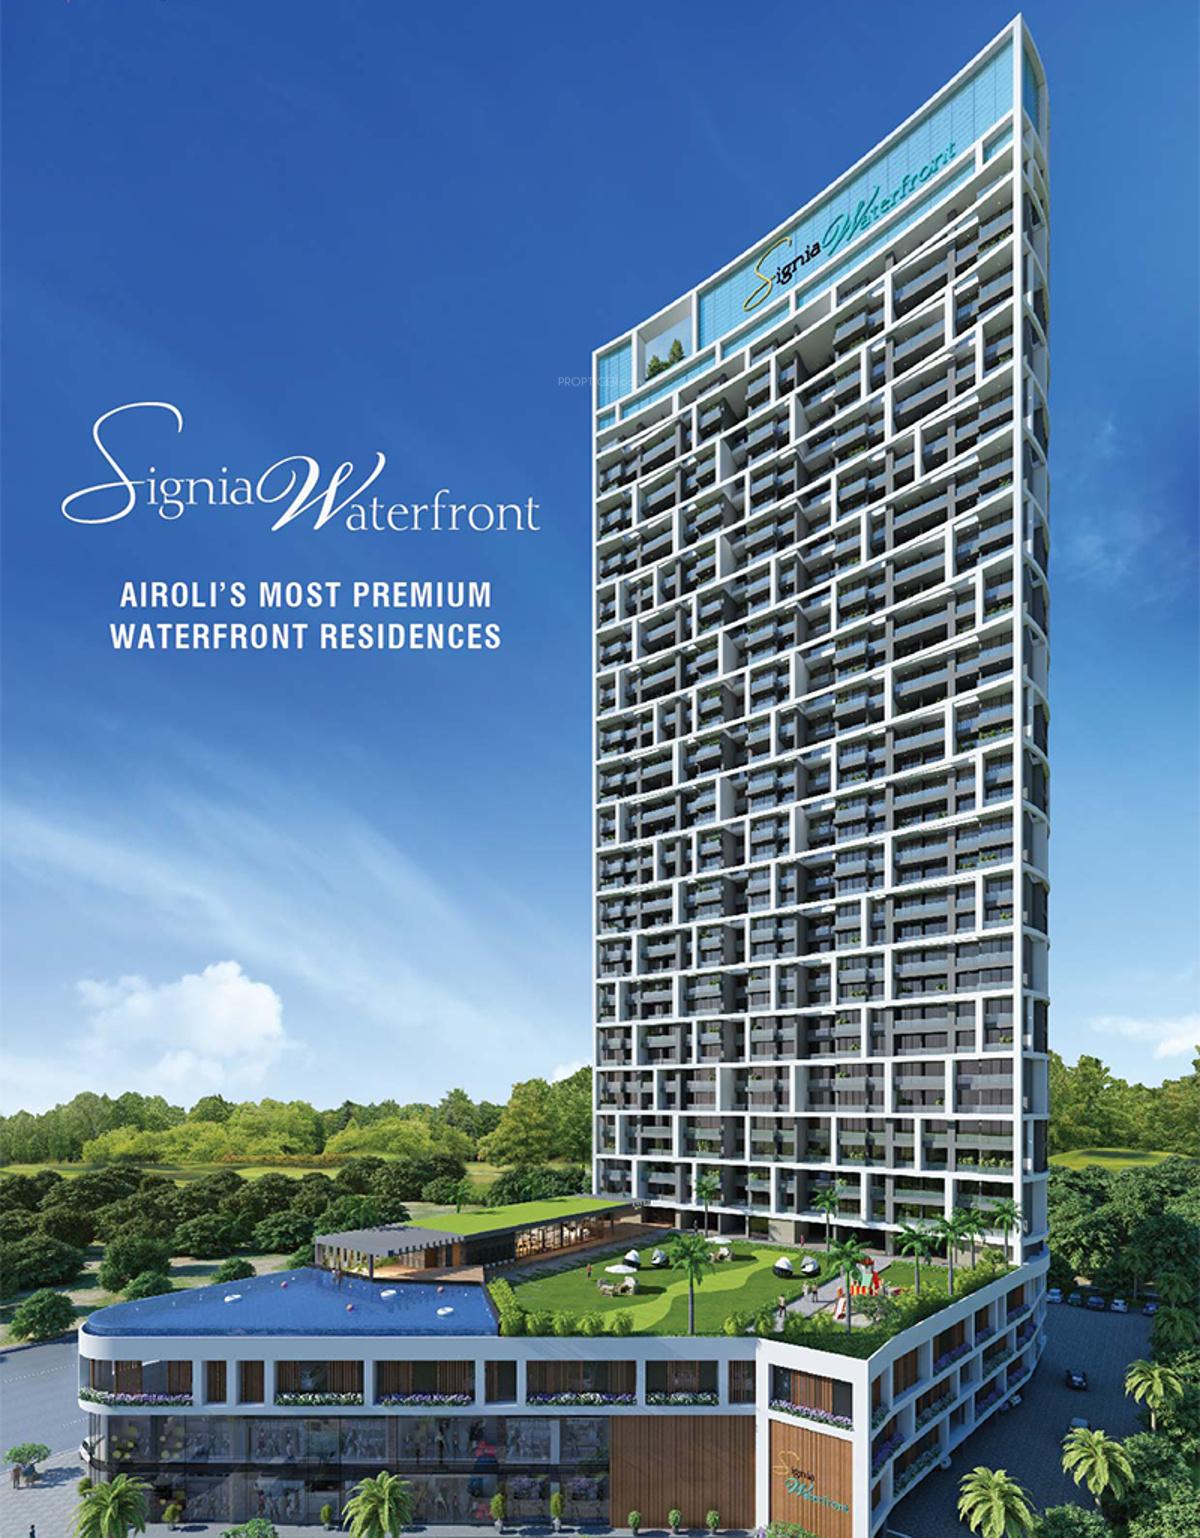 3 Bhk In Airoli Buy 3 Bhk Apartments Flats For Sale In Airoli Mumbai